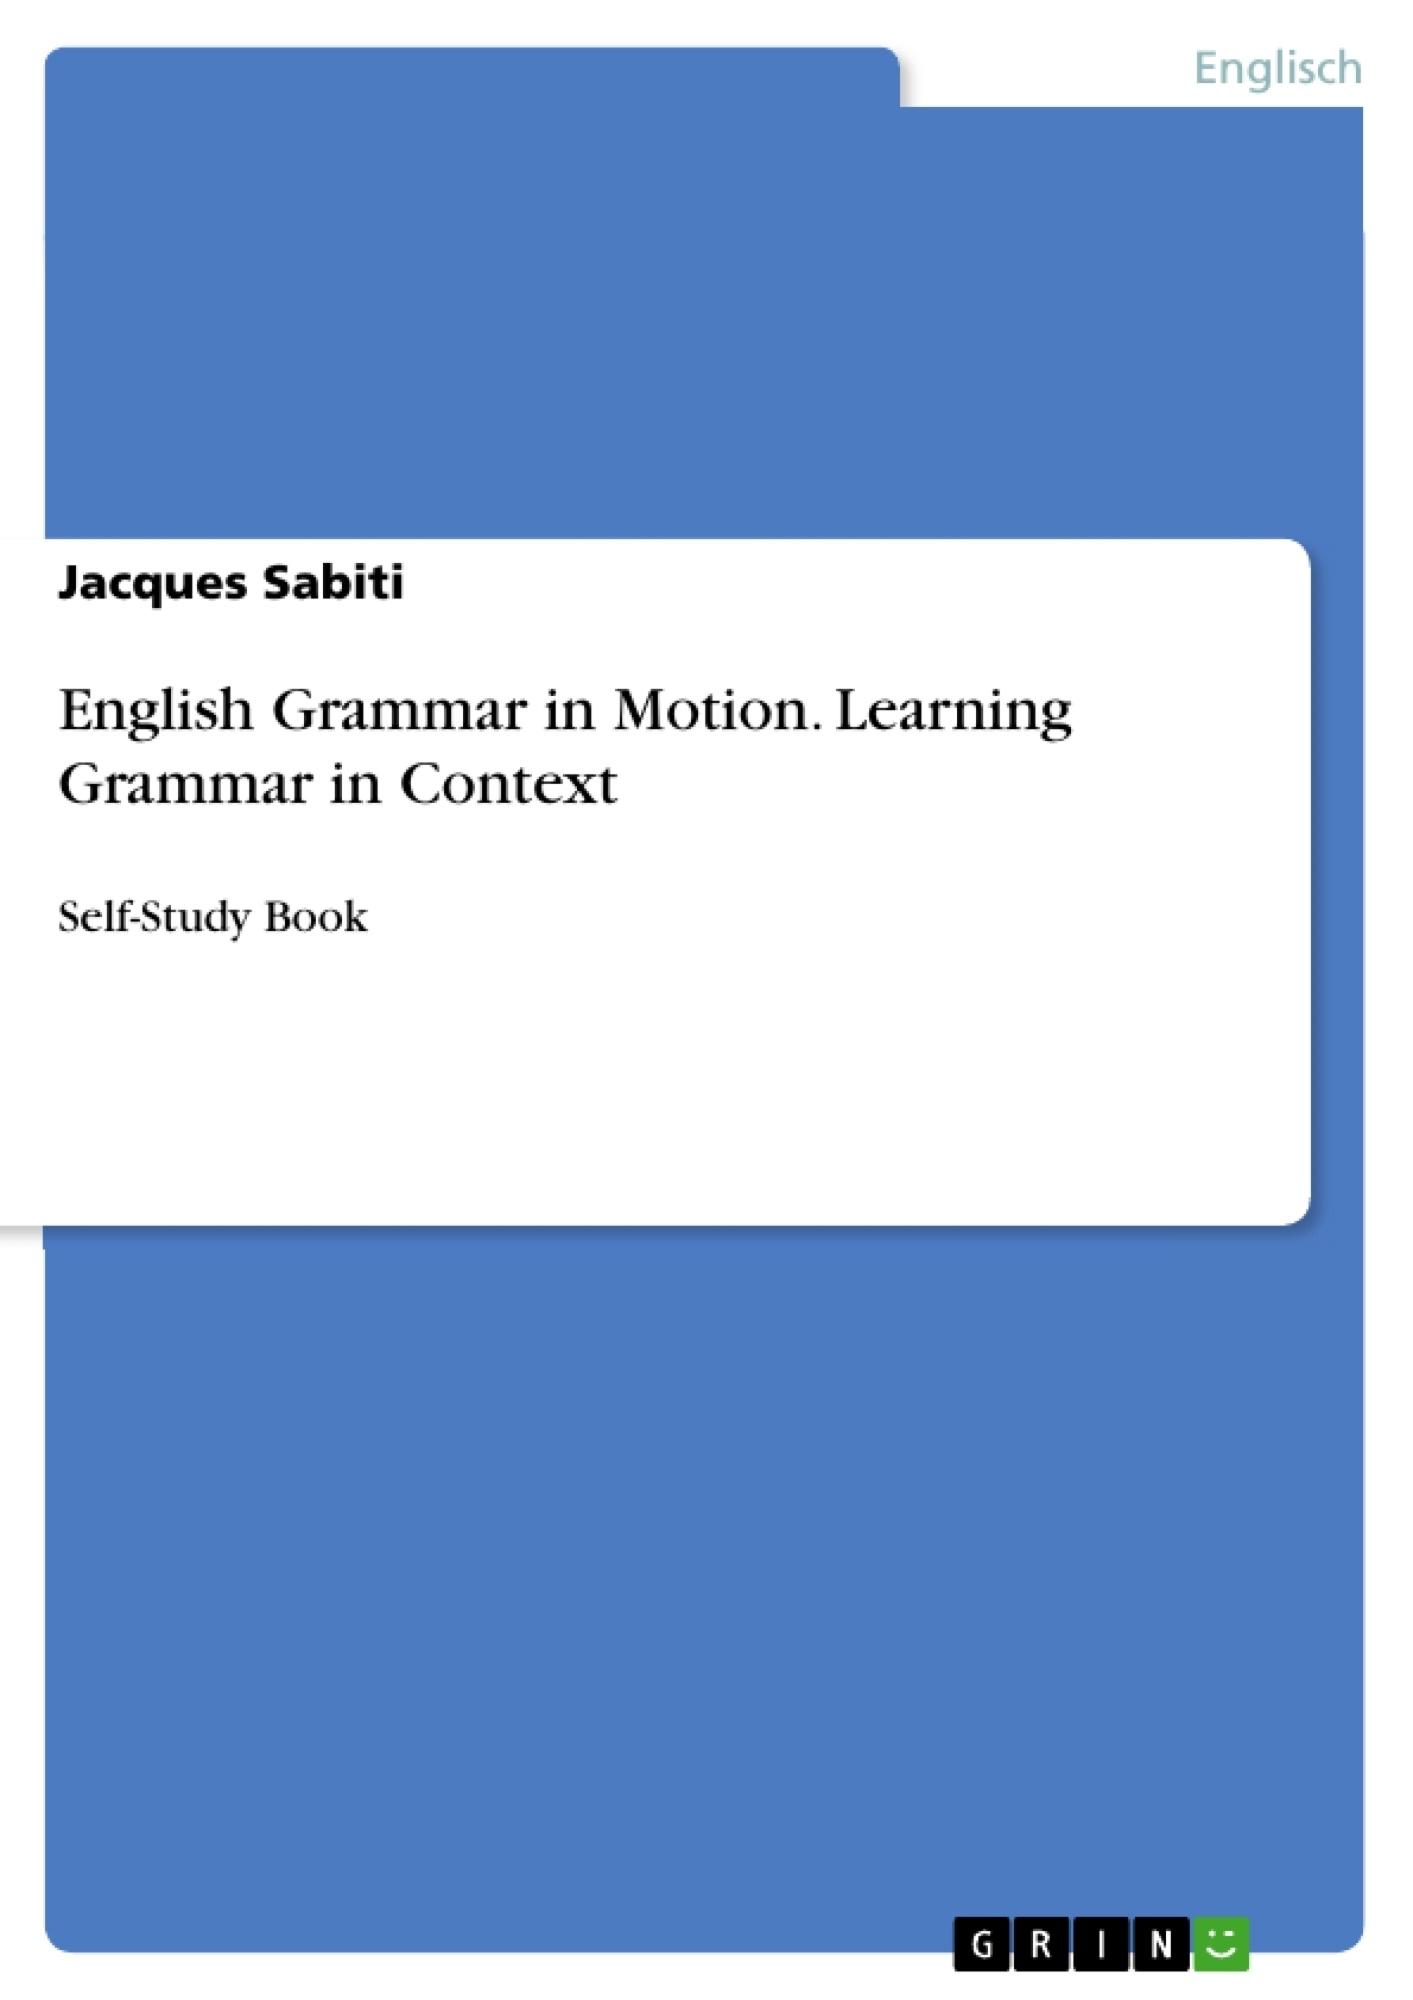 Titel: English Grammar in Motion. Learning Grammar in Context